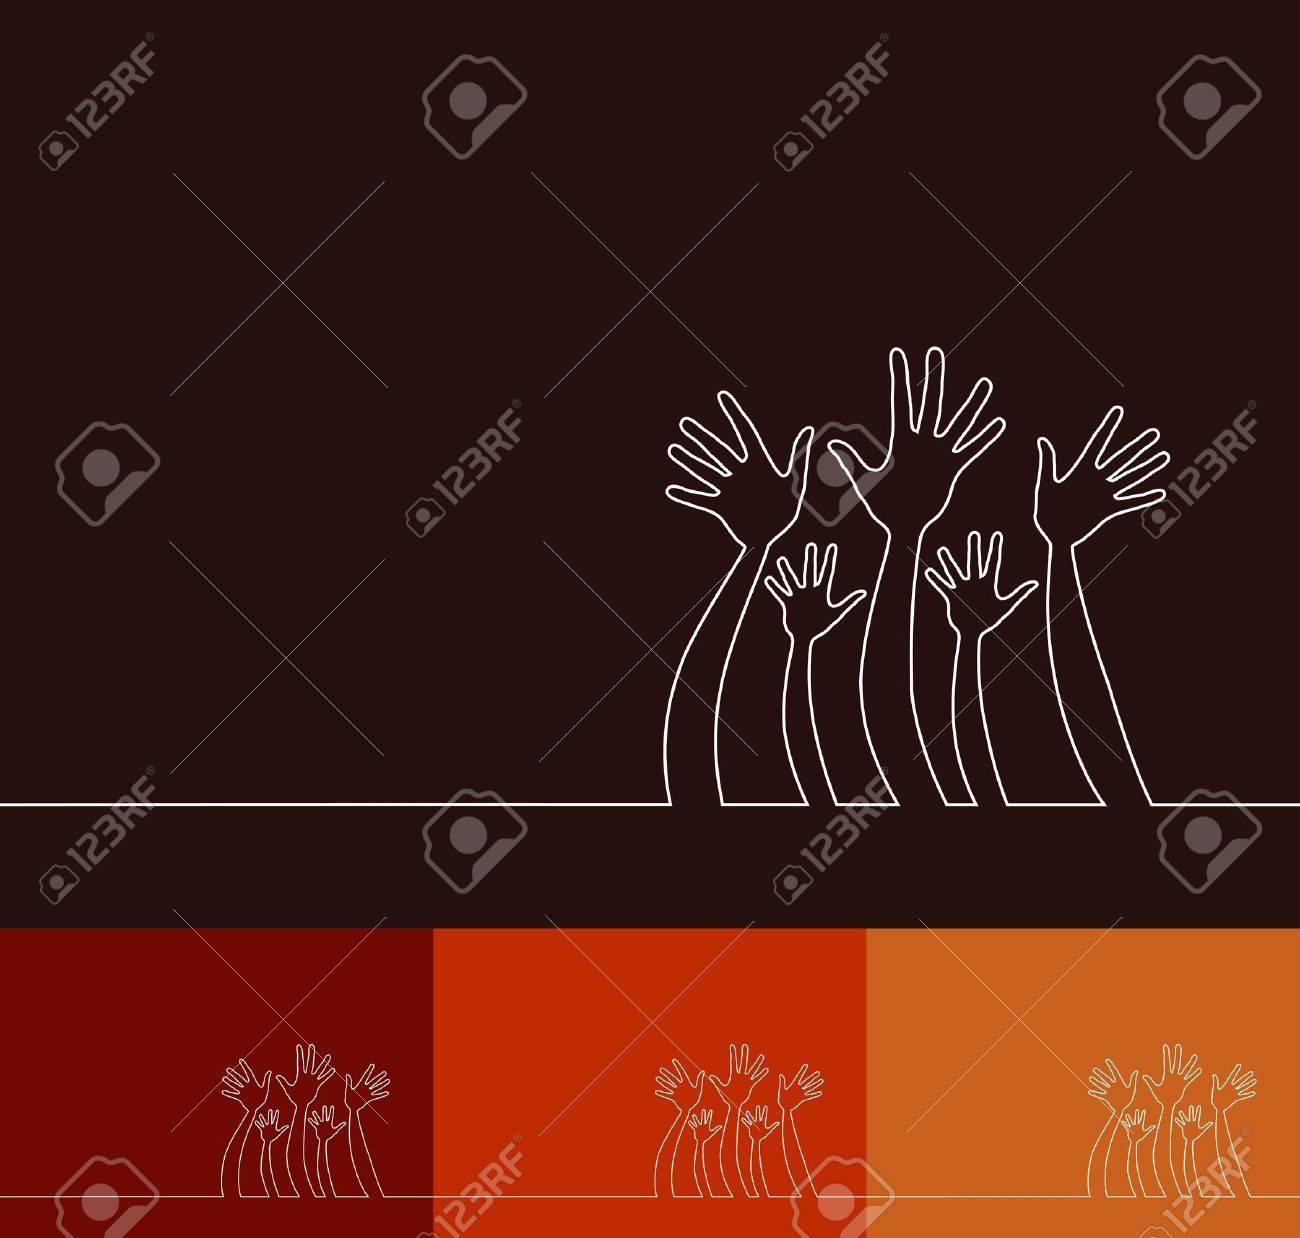 Simple line illustration of hands design. Stock Vector - 10809170